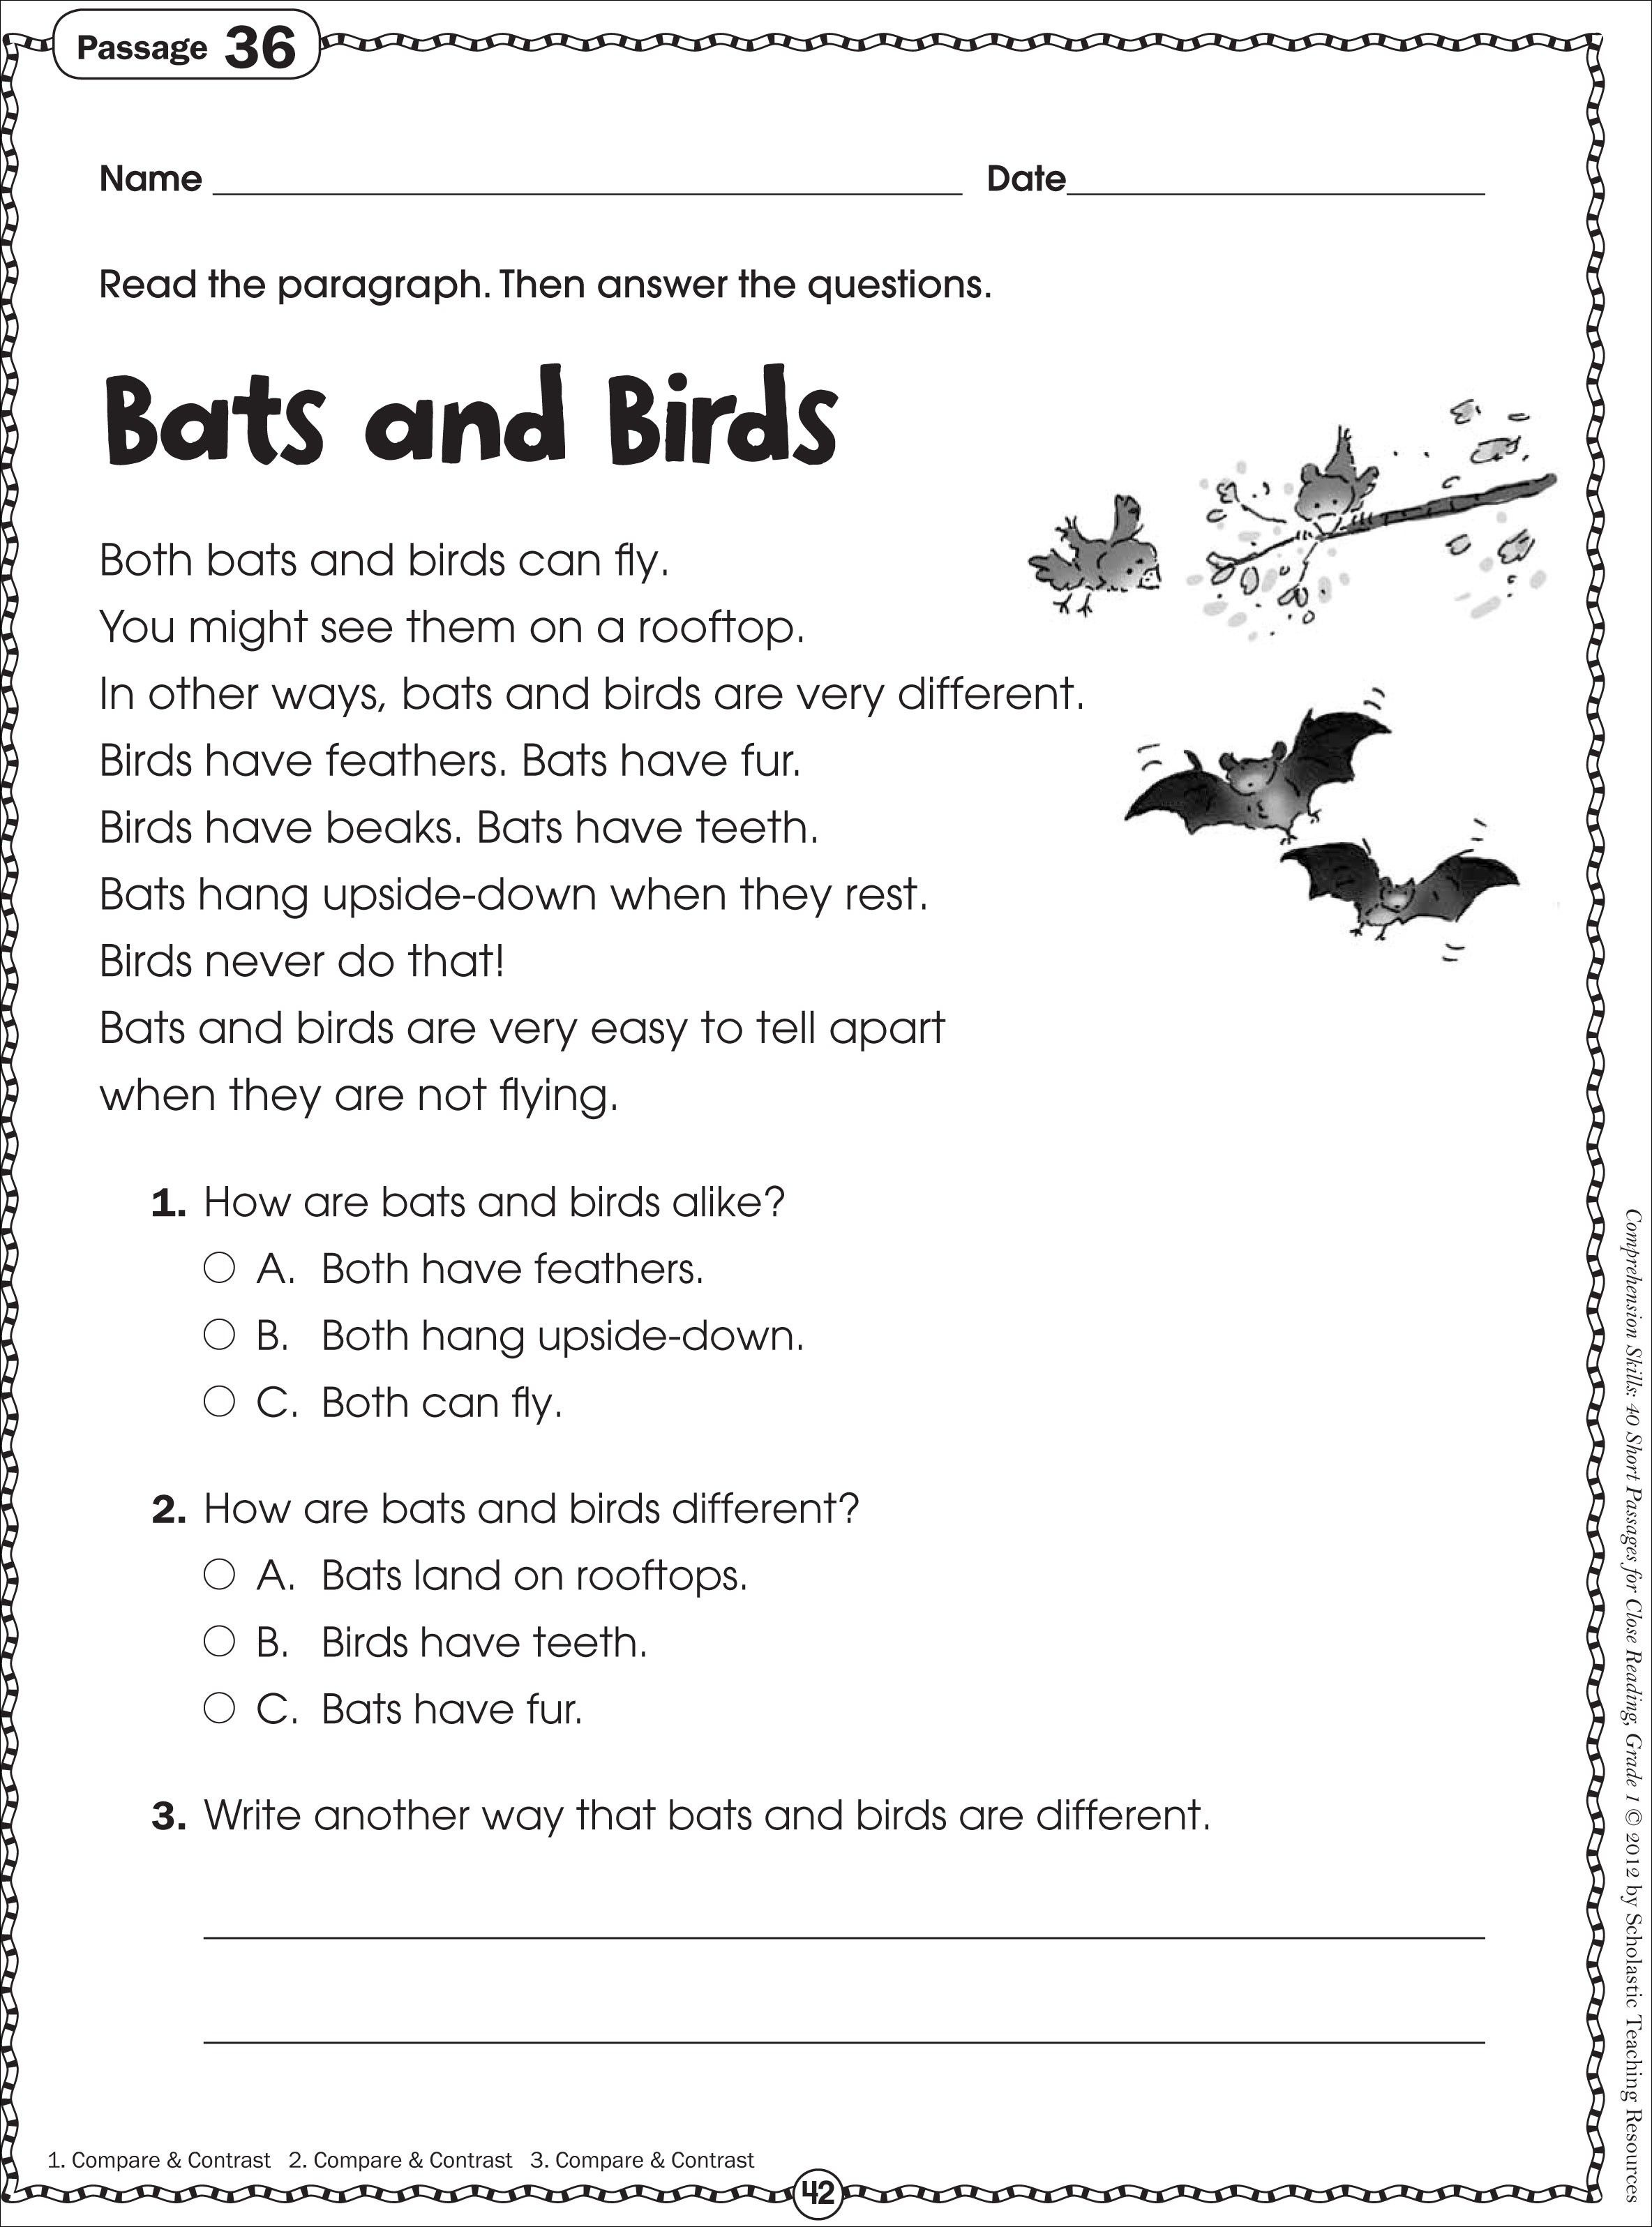 Free Printable Reading Comprehension Worksheet For